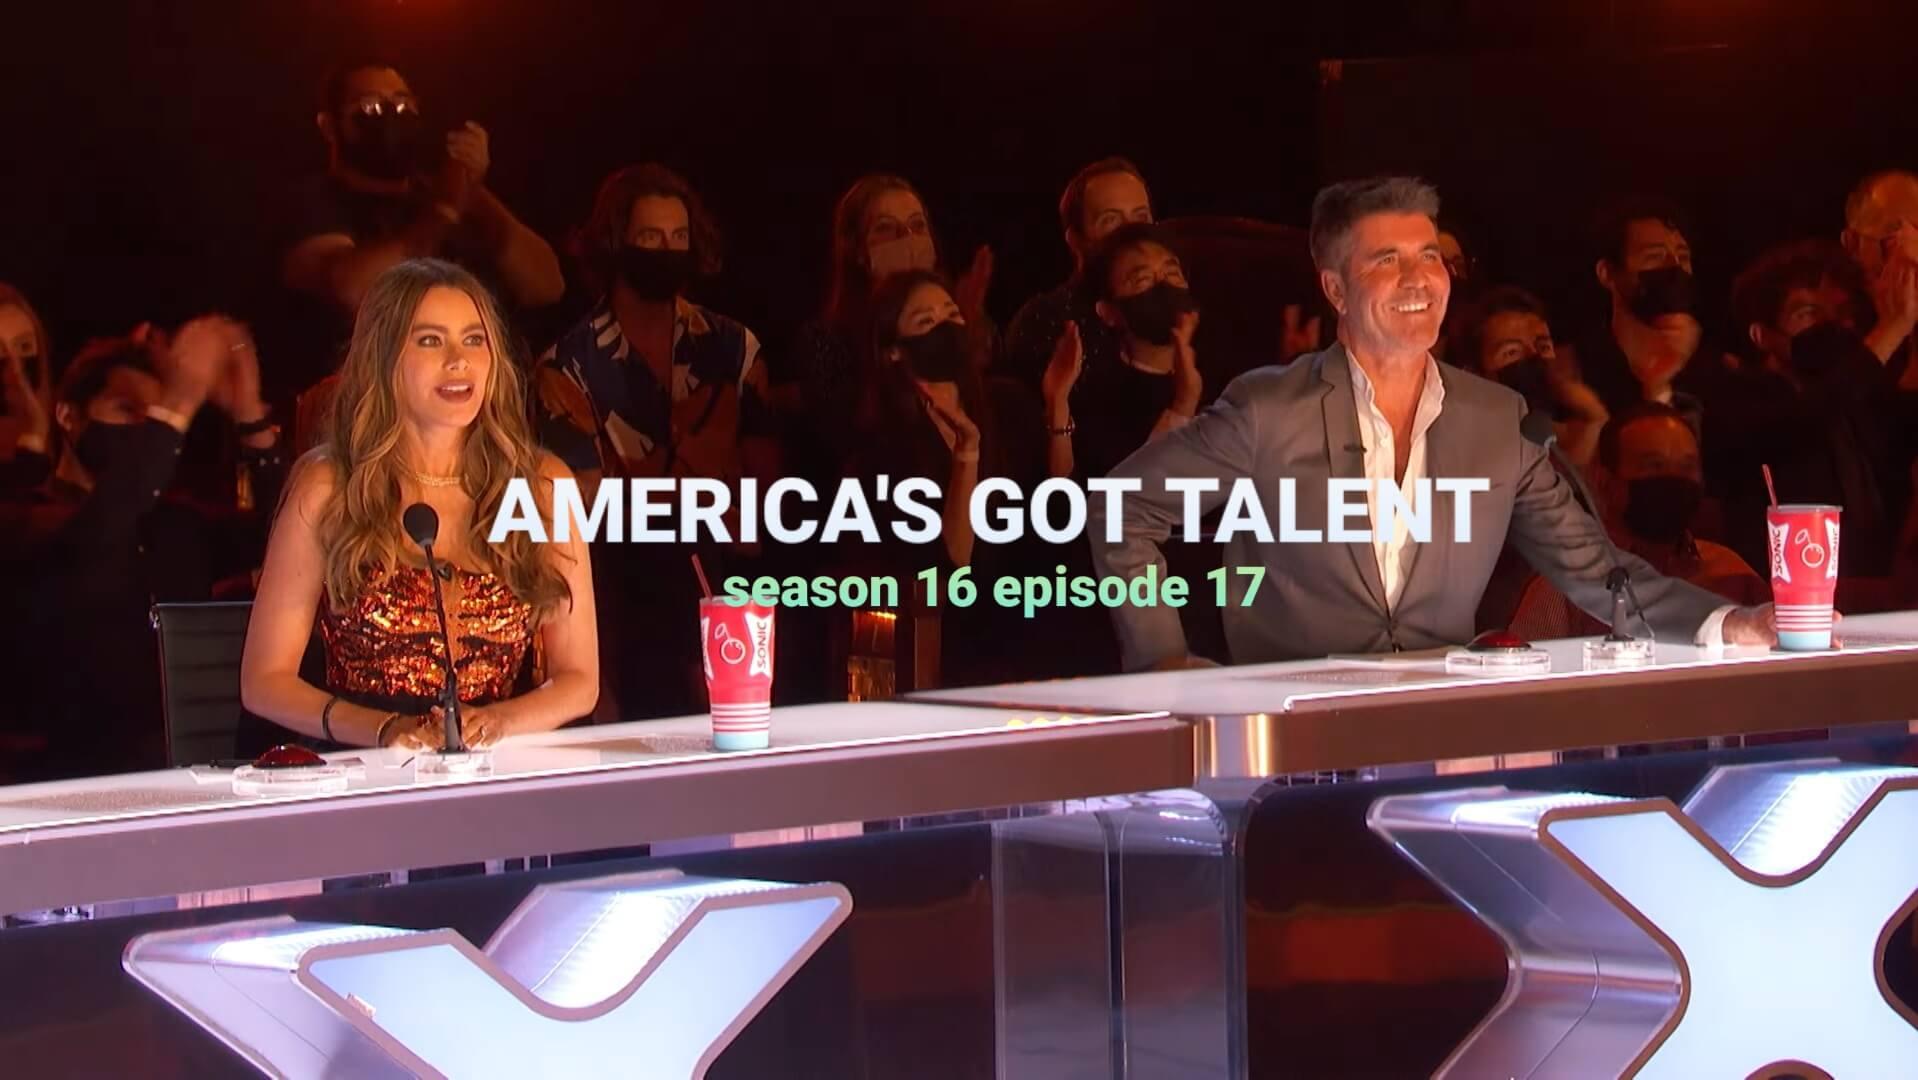 America's Got Talent episode 17 season 16 Release date